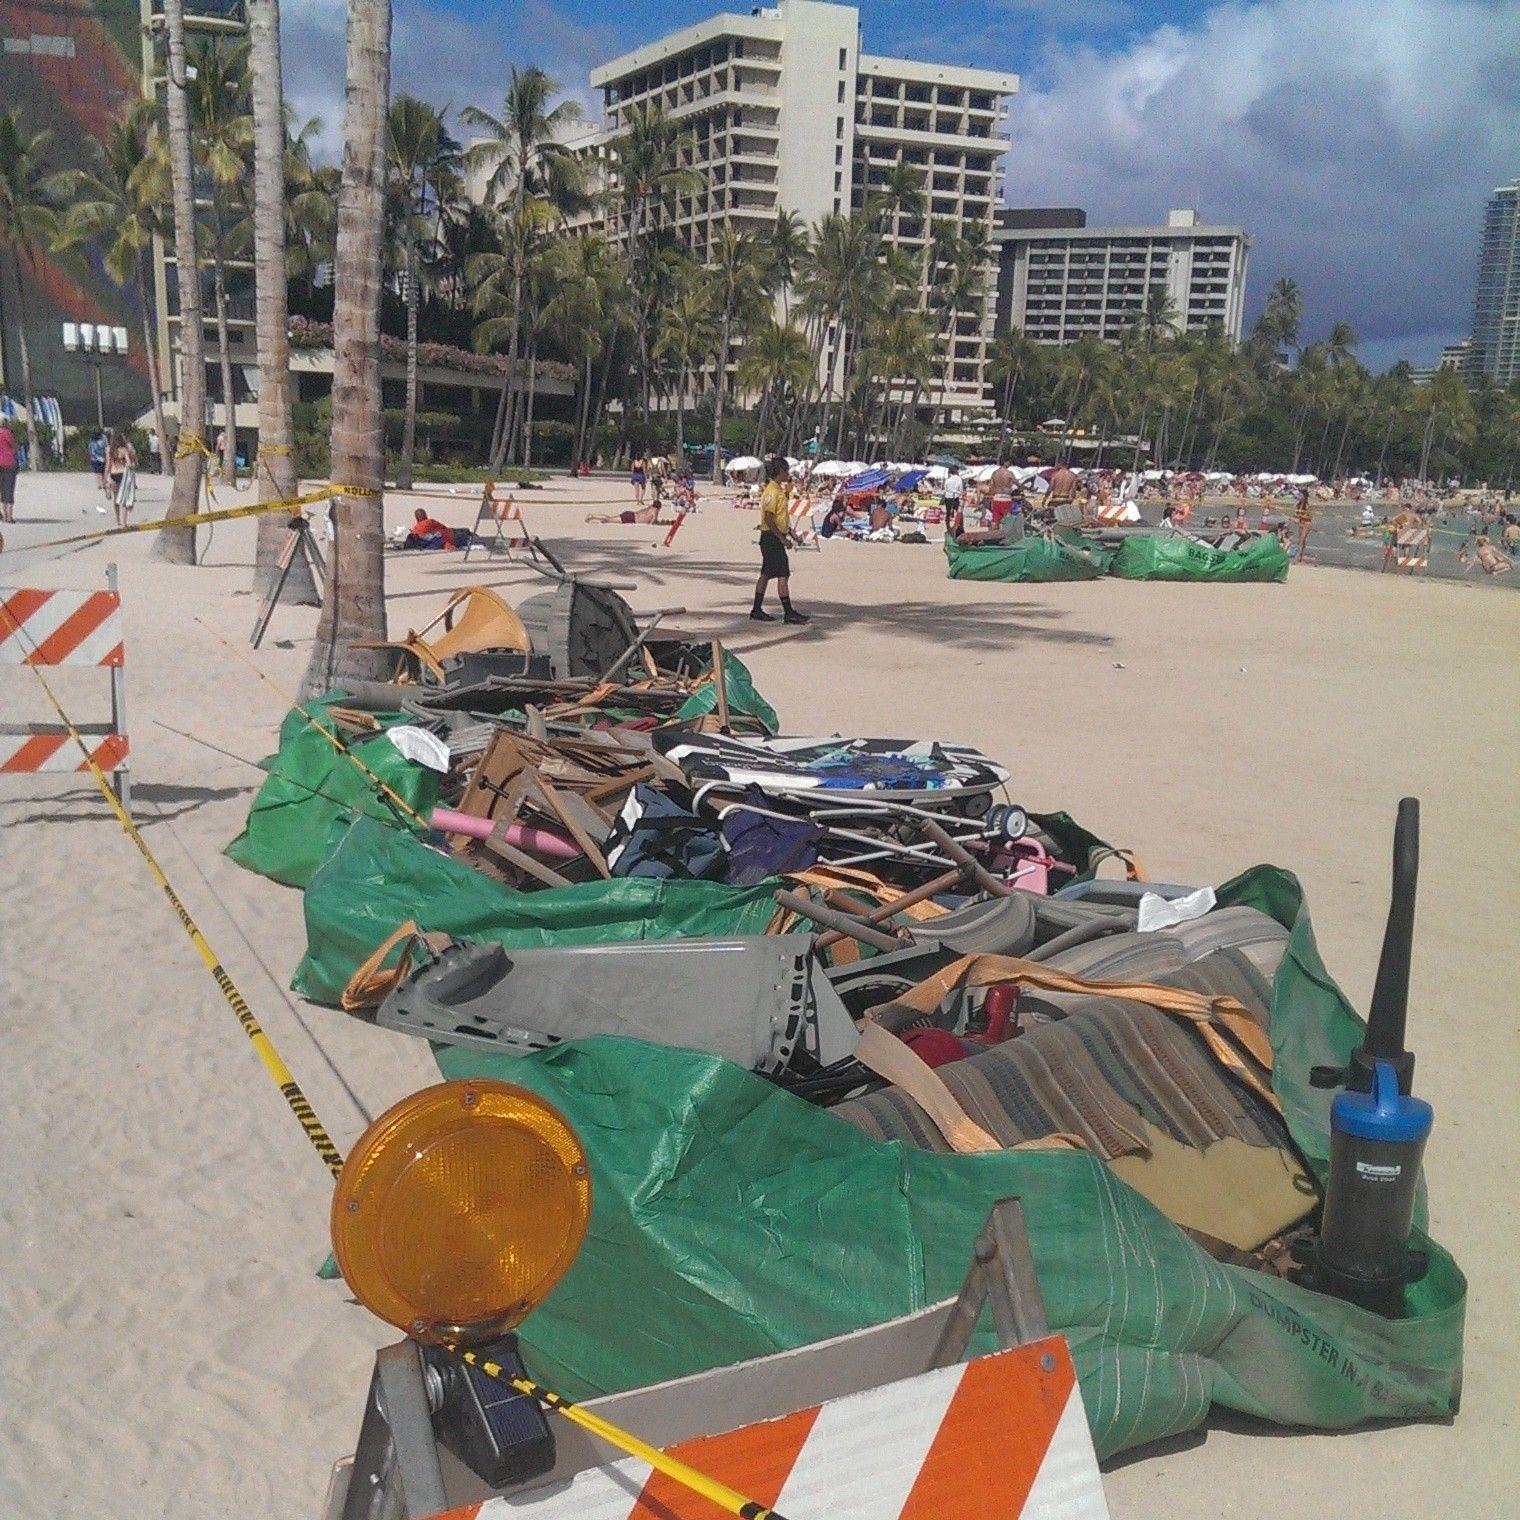 hawaiian godzilla coming to waikiki debris from